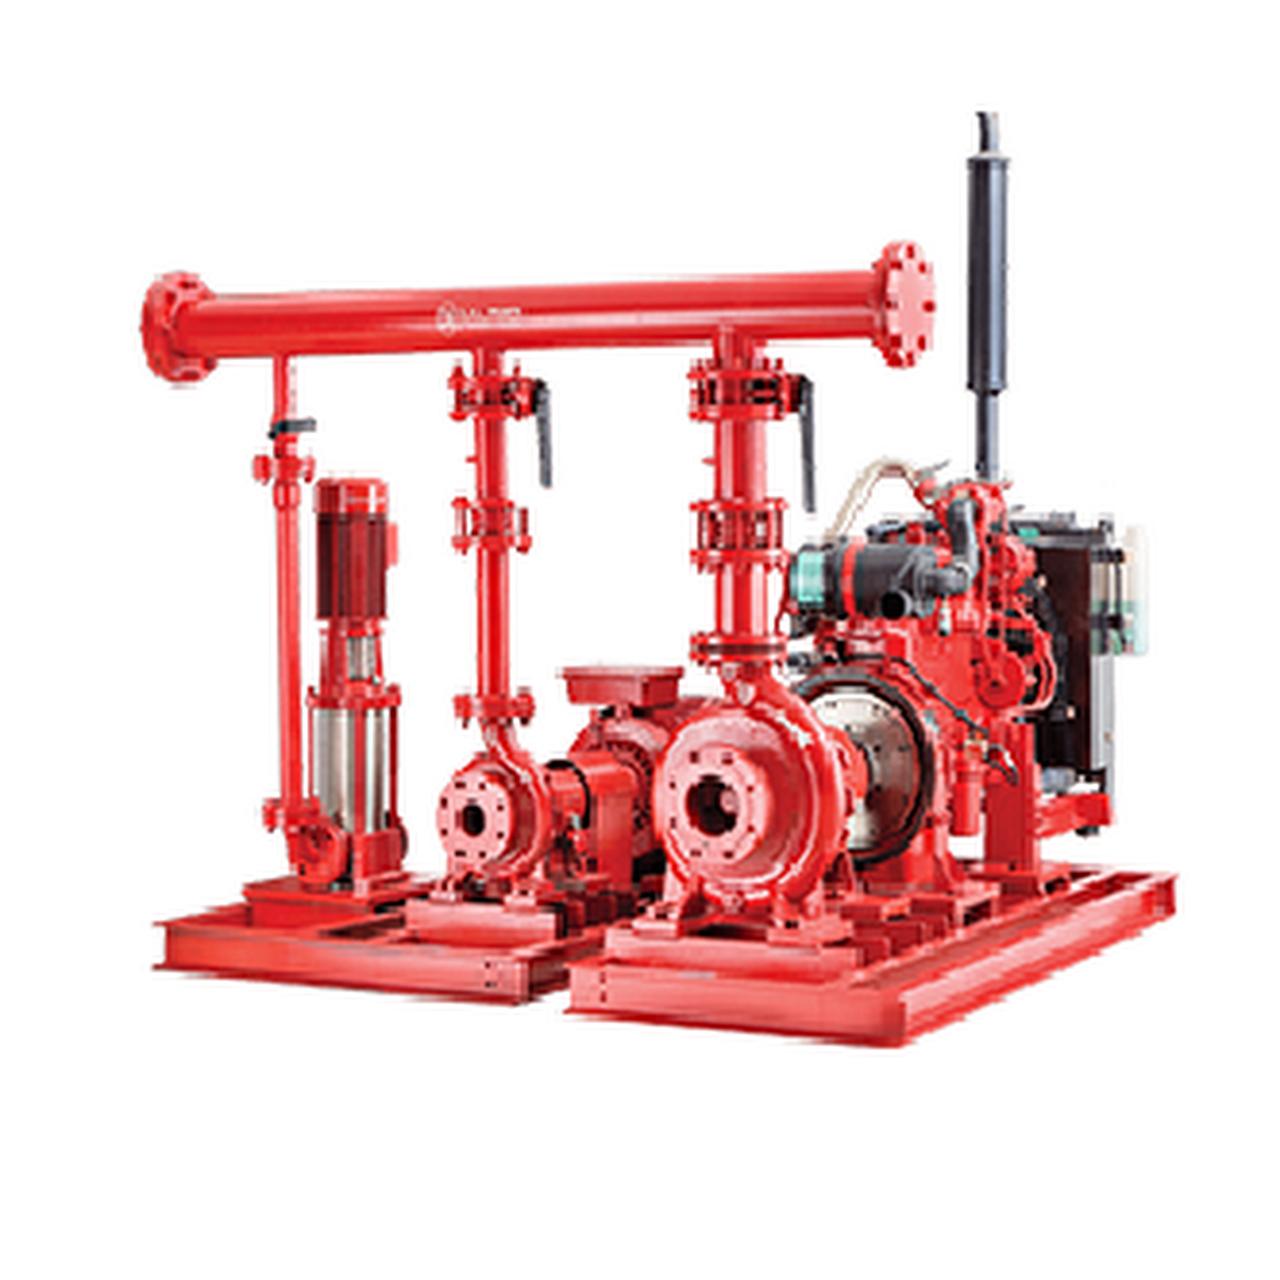 Bhoomi Sales & Service (Fire Pumps, Pressure System